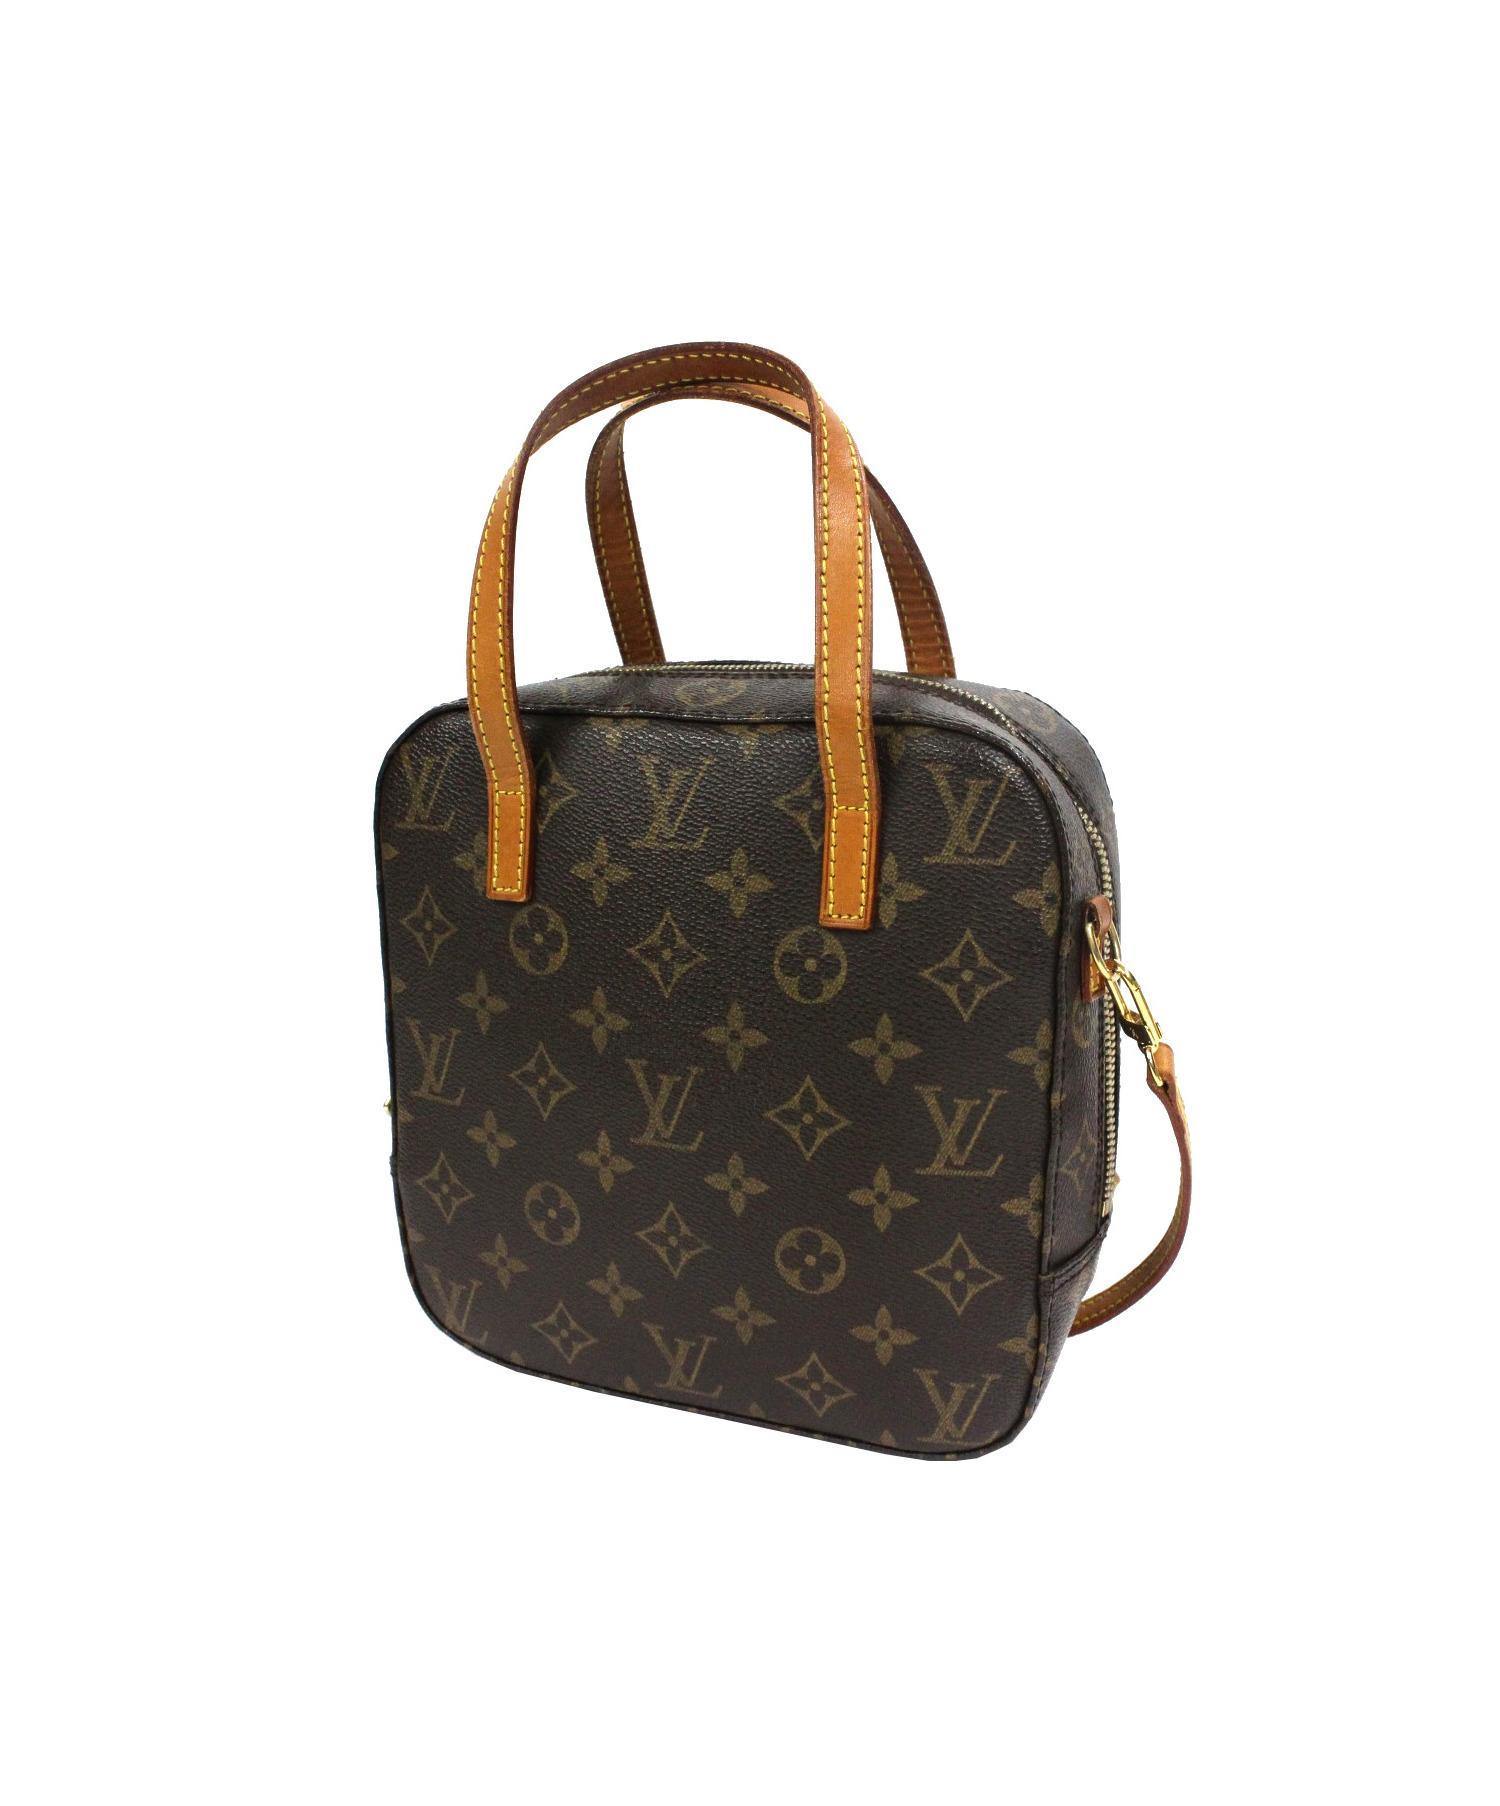 3914cc90df10 中古・古着通販】LOUIS VUITTON (ルイ・ヴィトン) 2WAYハンドバッグ ...